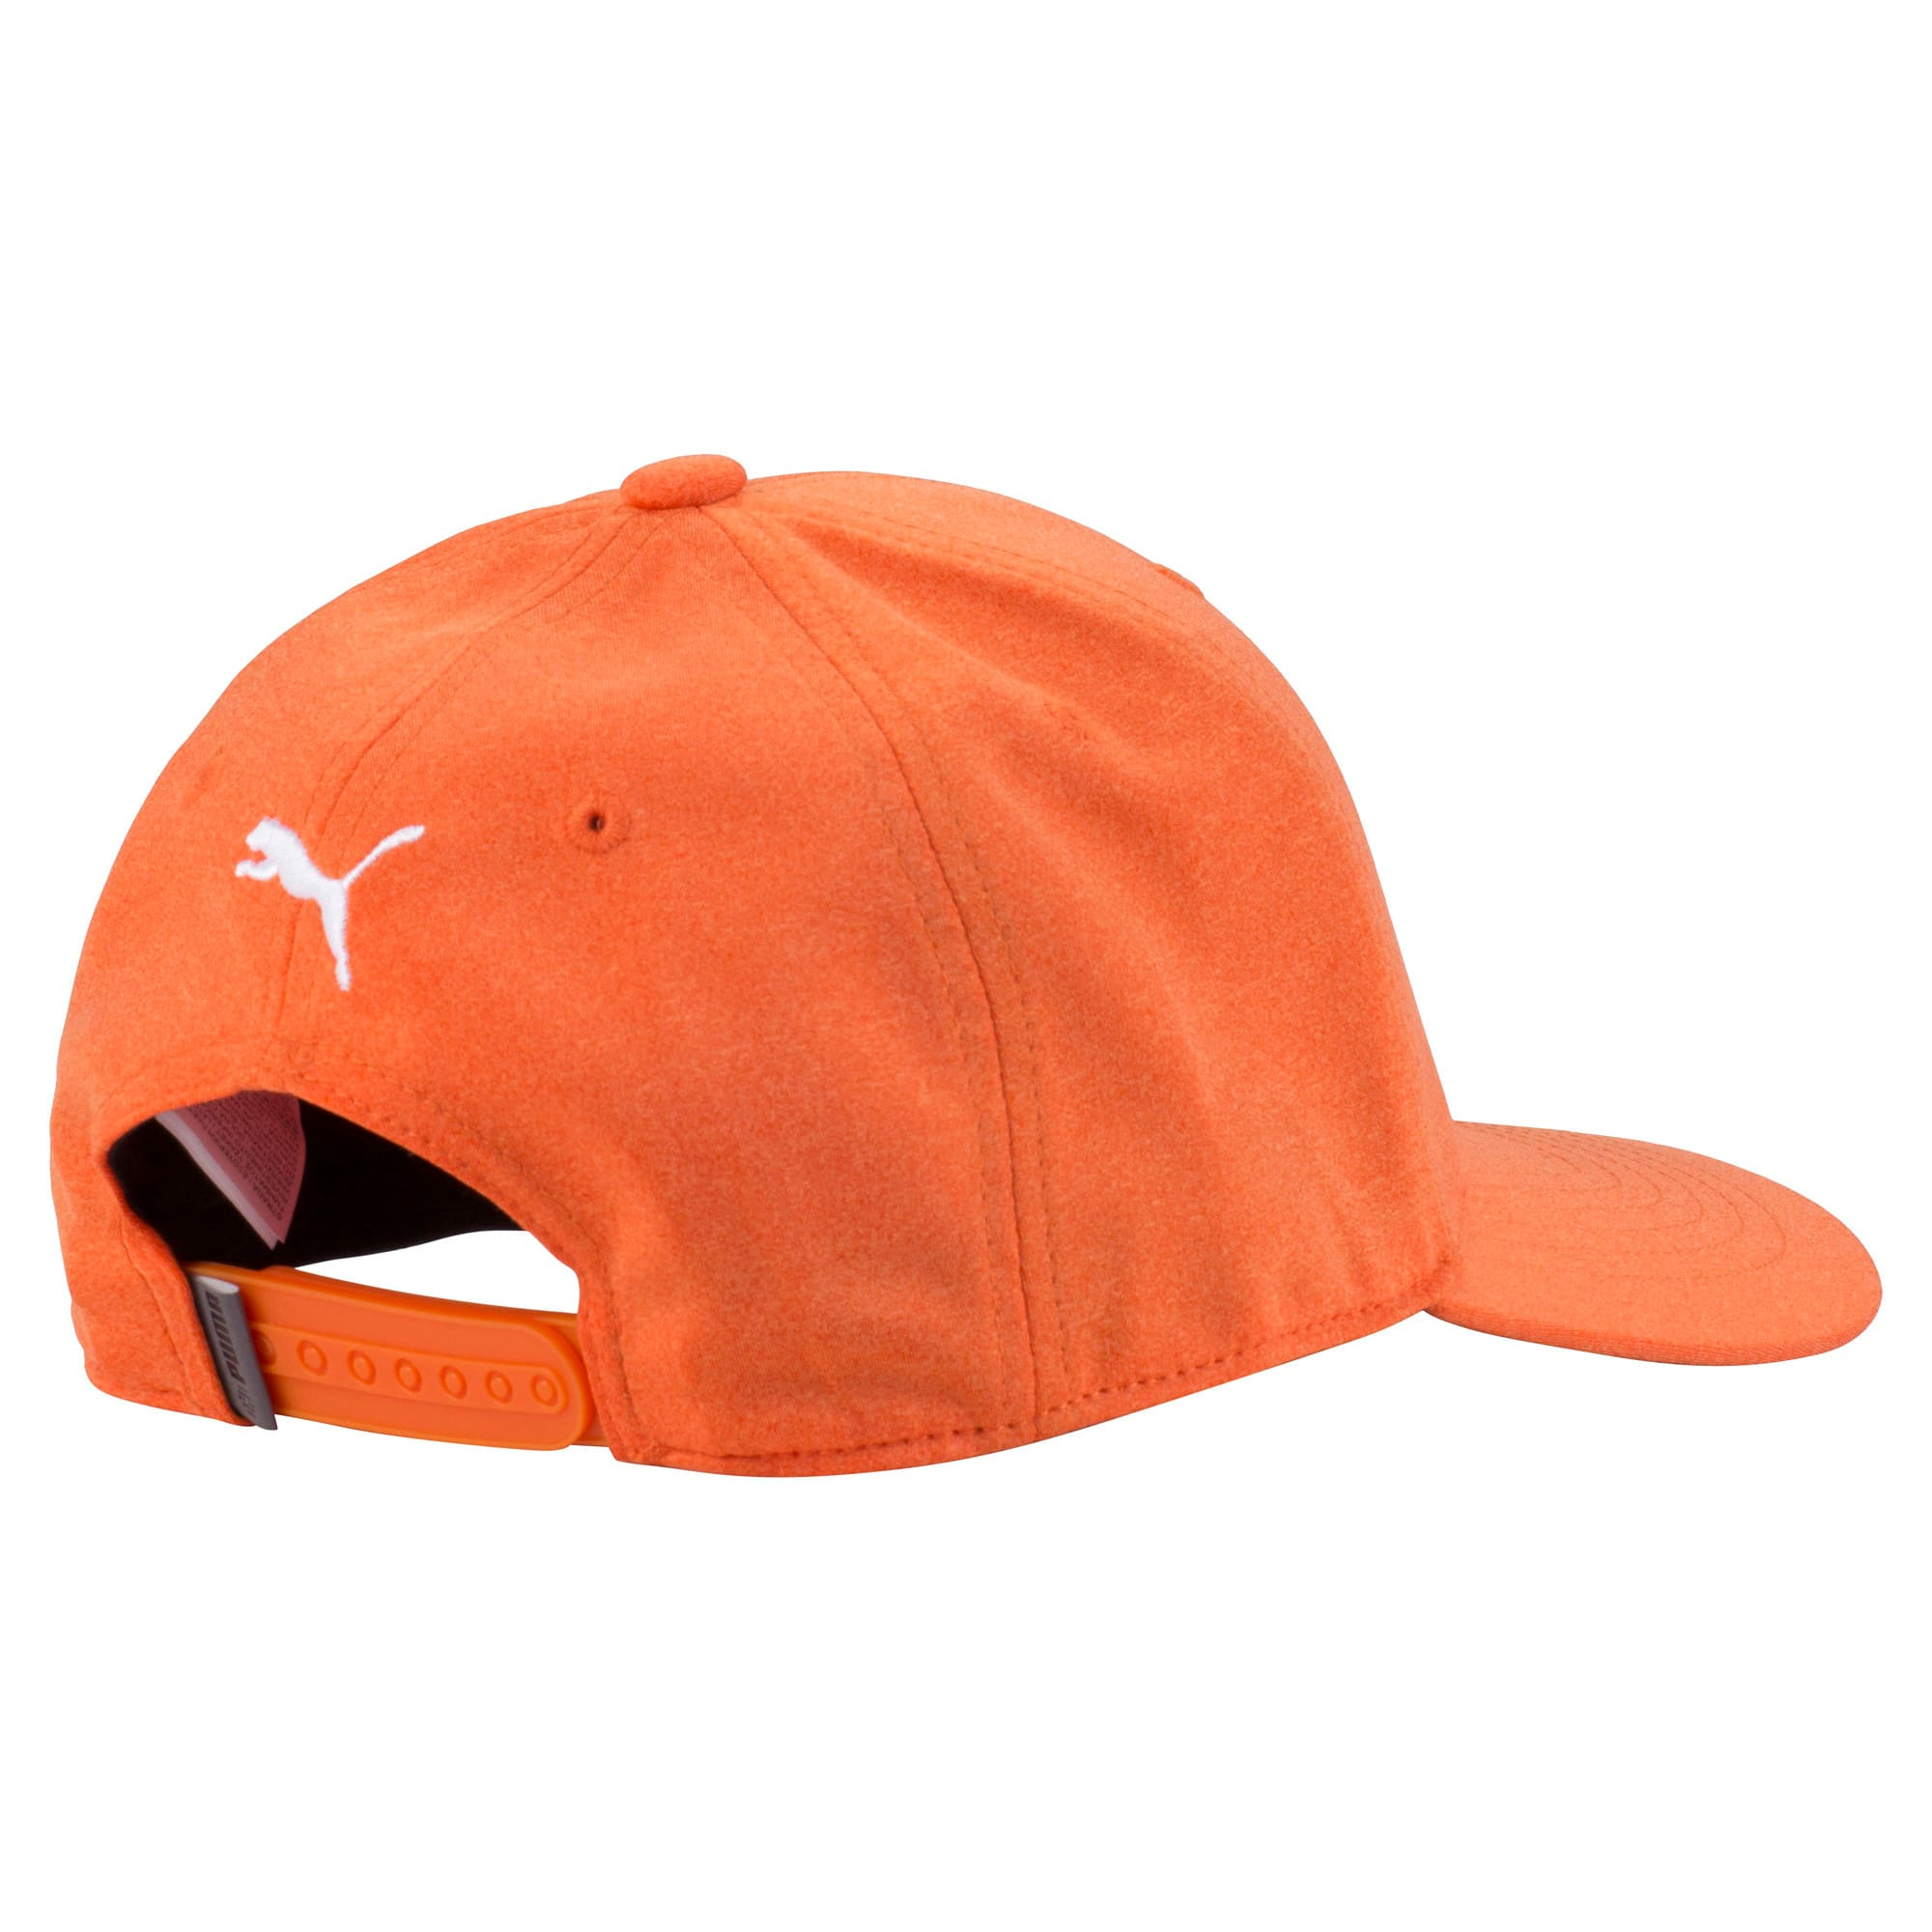 Thumbnail 2 of ゴルフ Pマークスナップバックキャップ, Vibrant Orange, medium-JPN